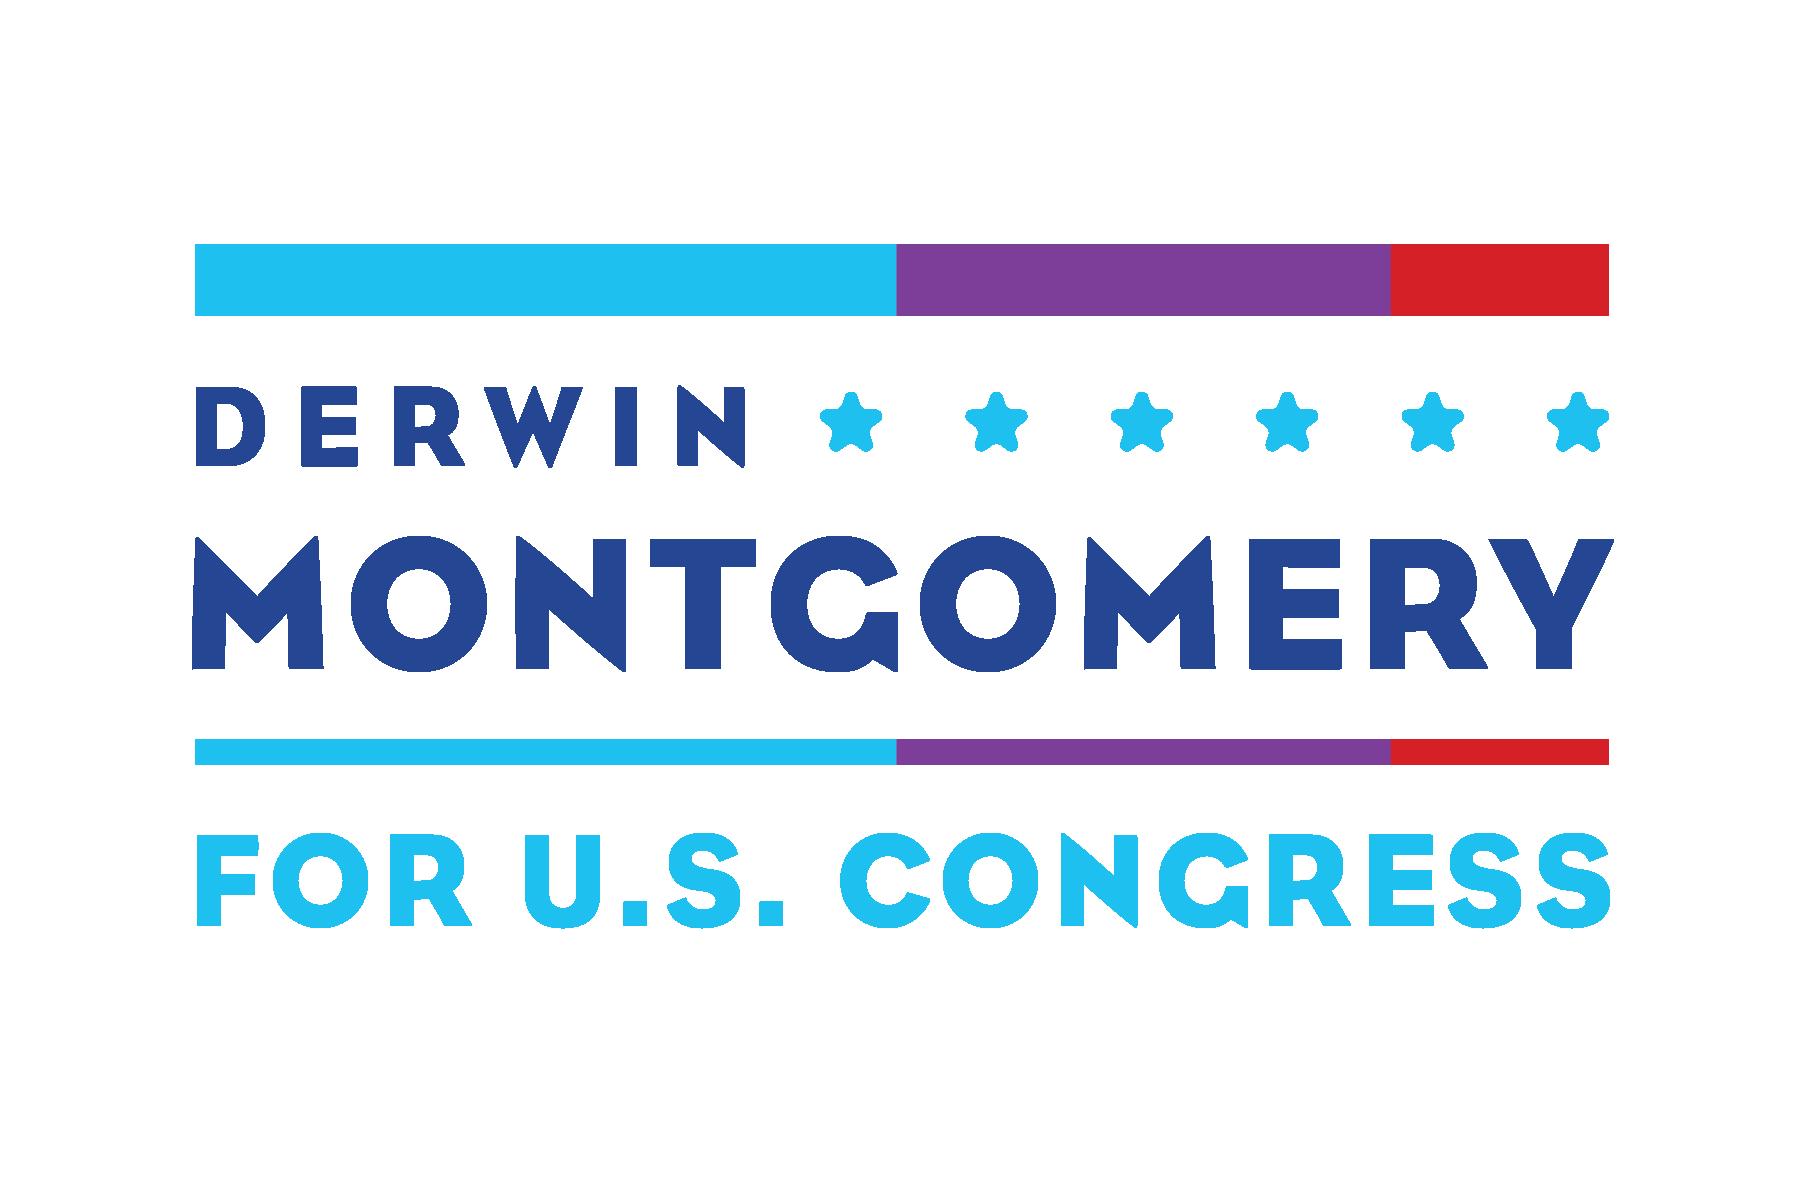 Derwin Montgomery for Congress